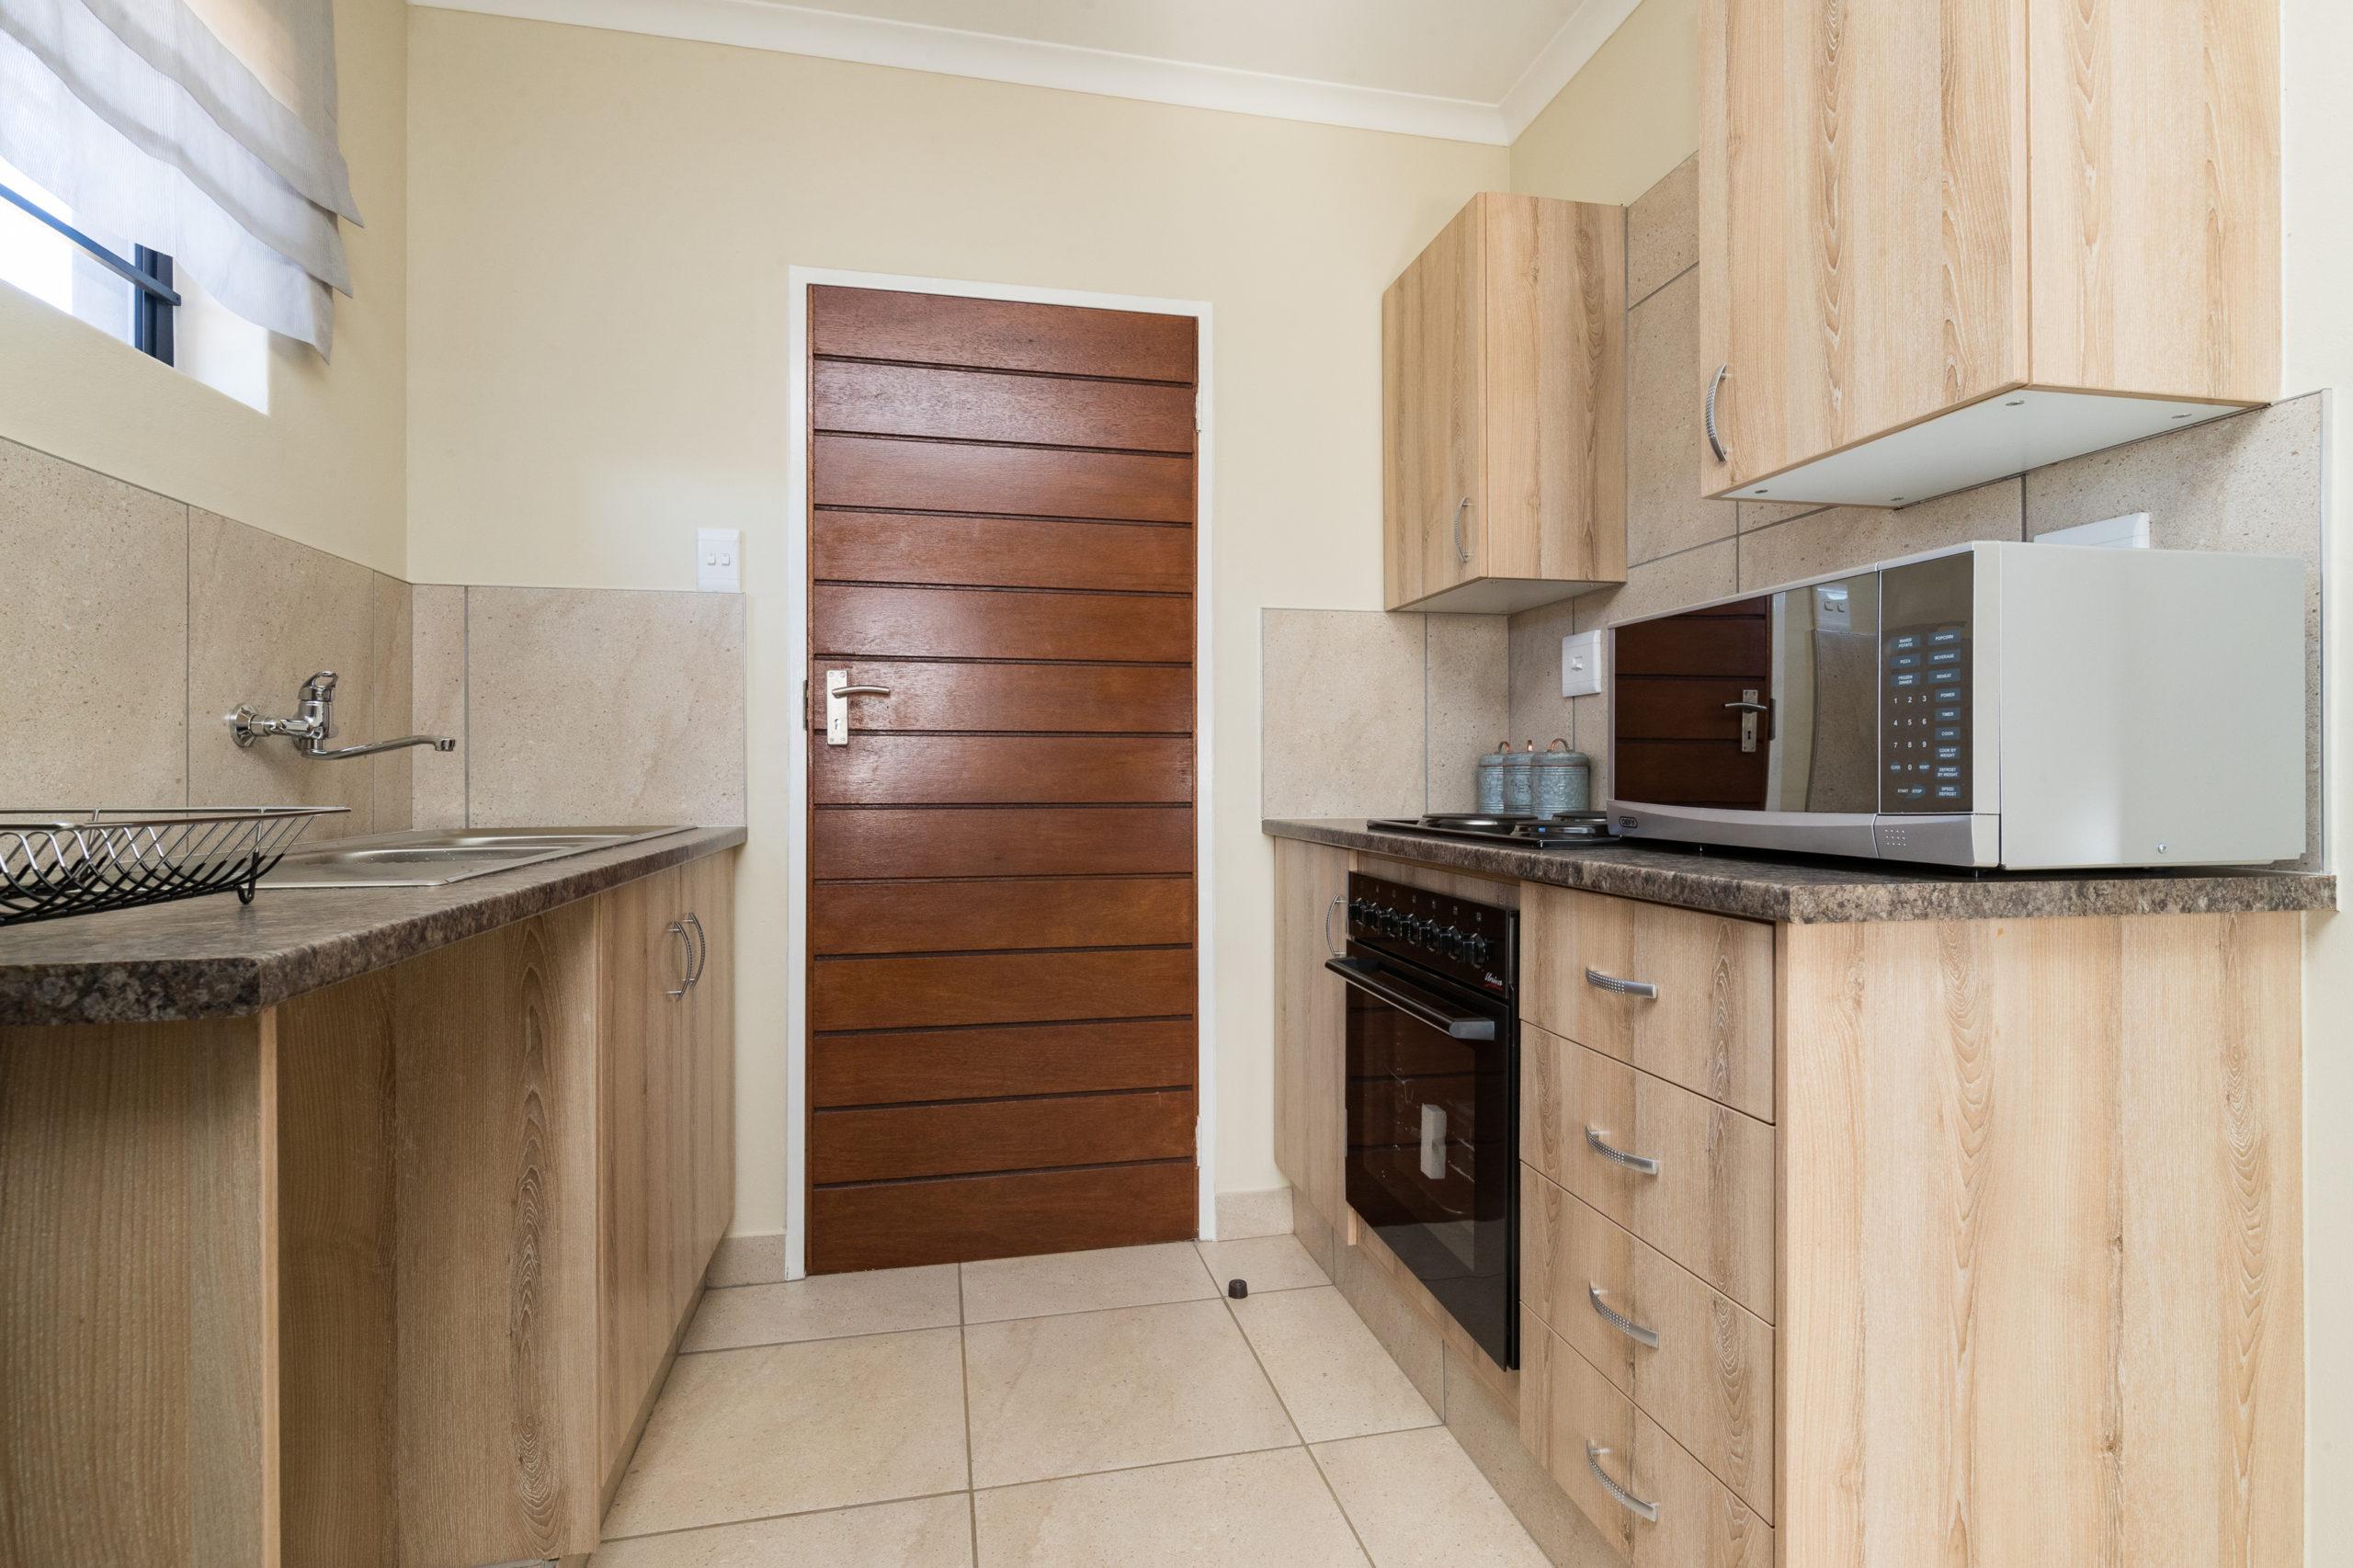 Royal Cradle, Homes for Sale in Mindalore, Gauteng - Kitchen